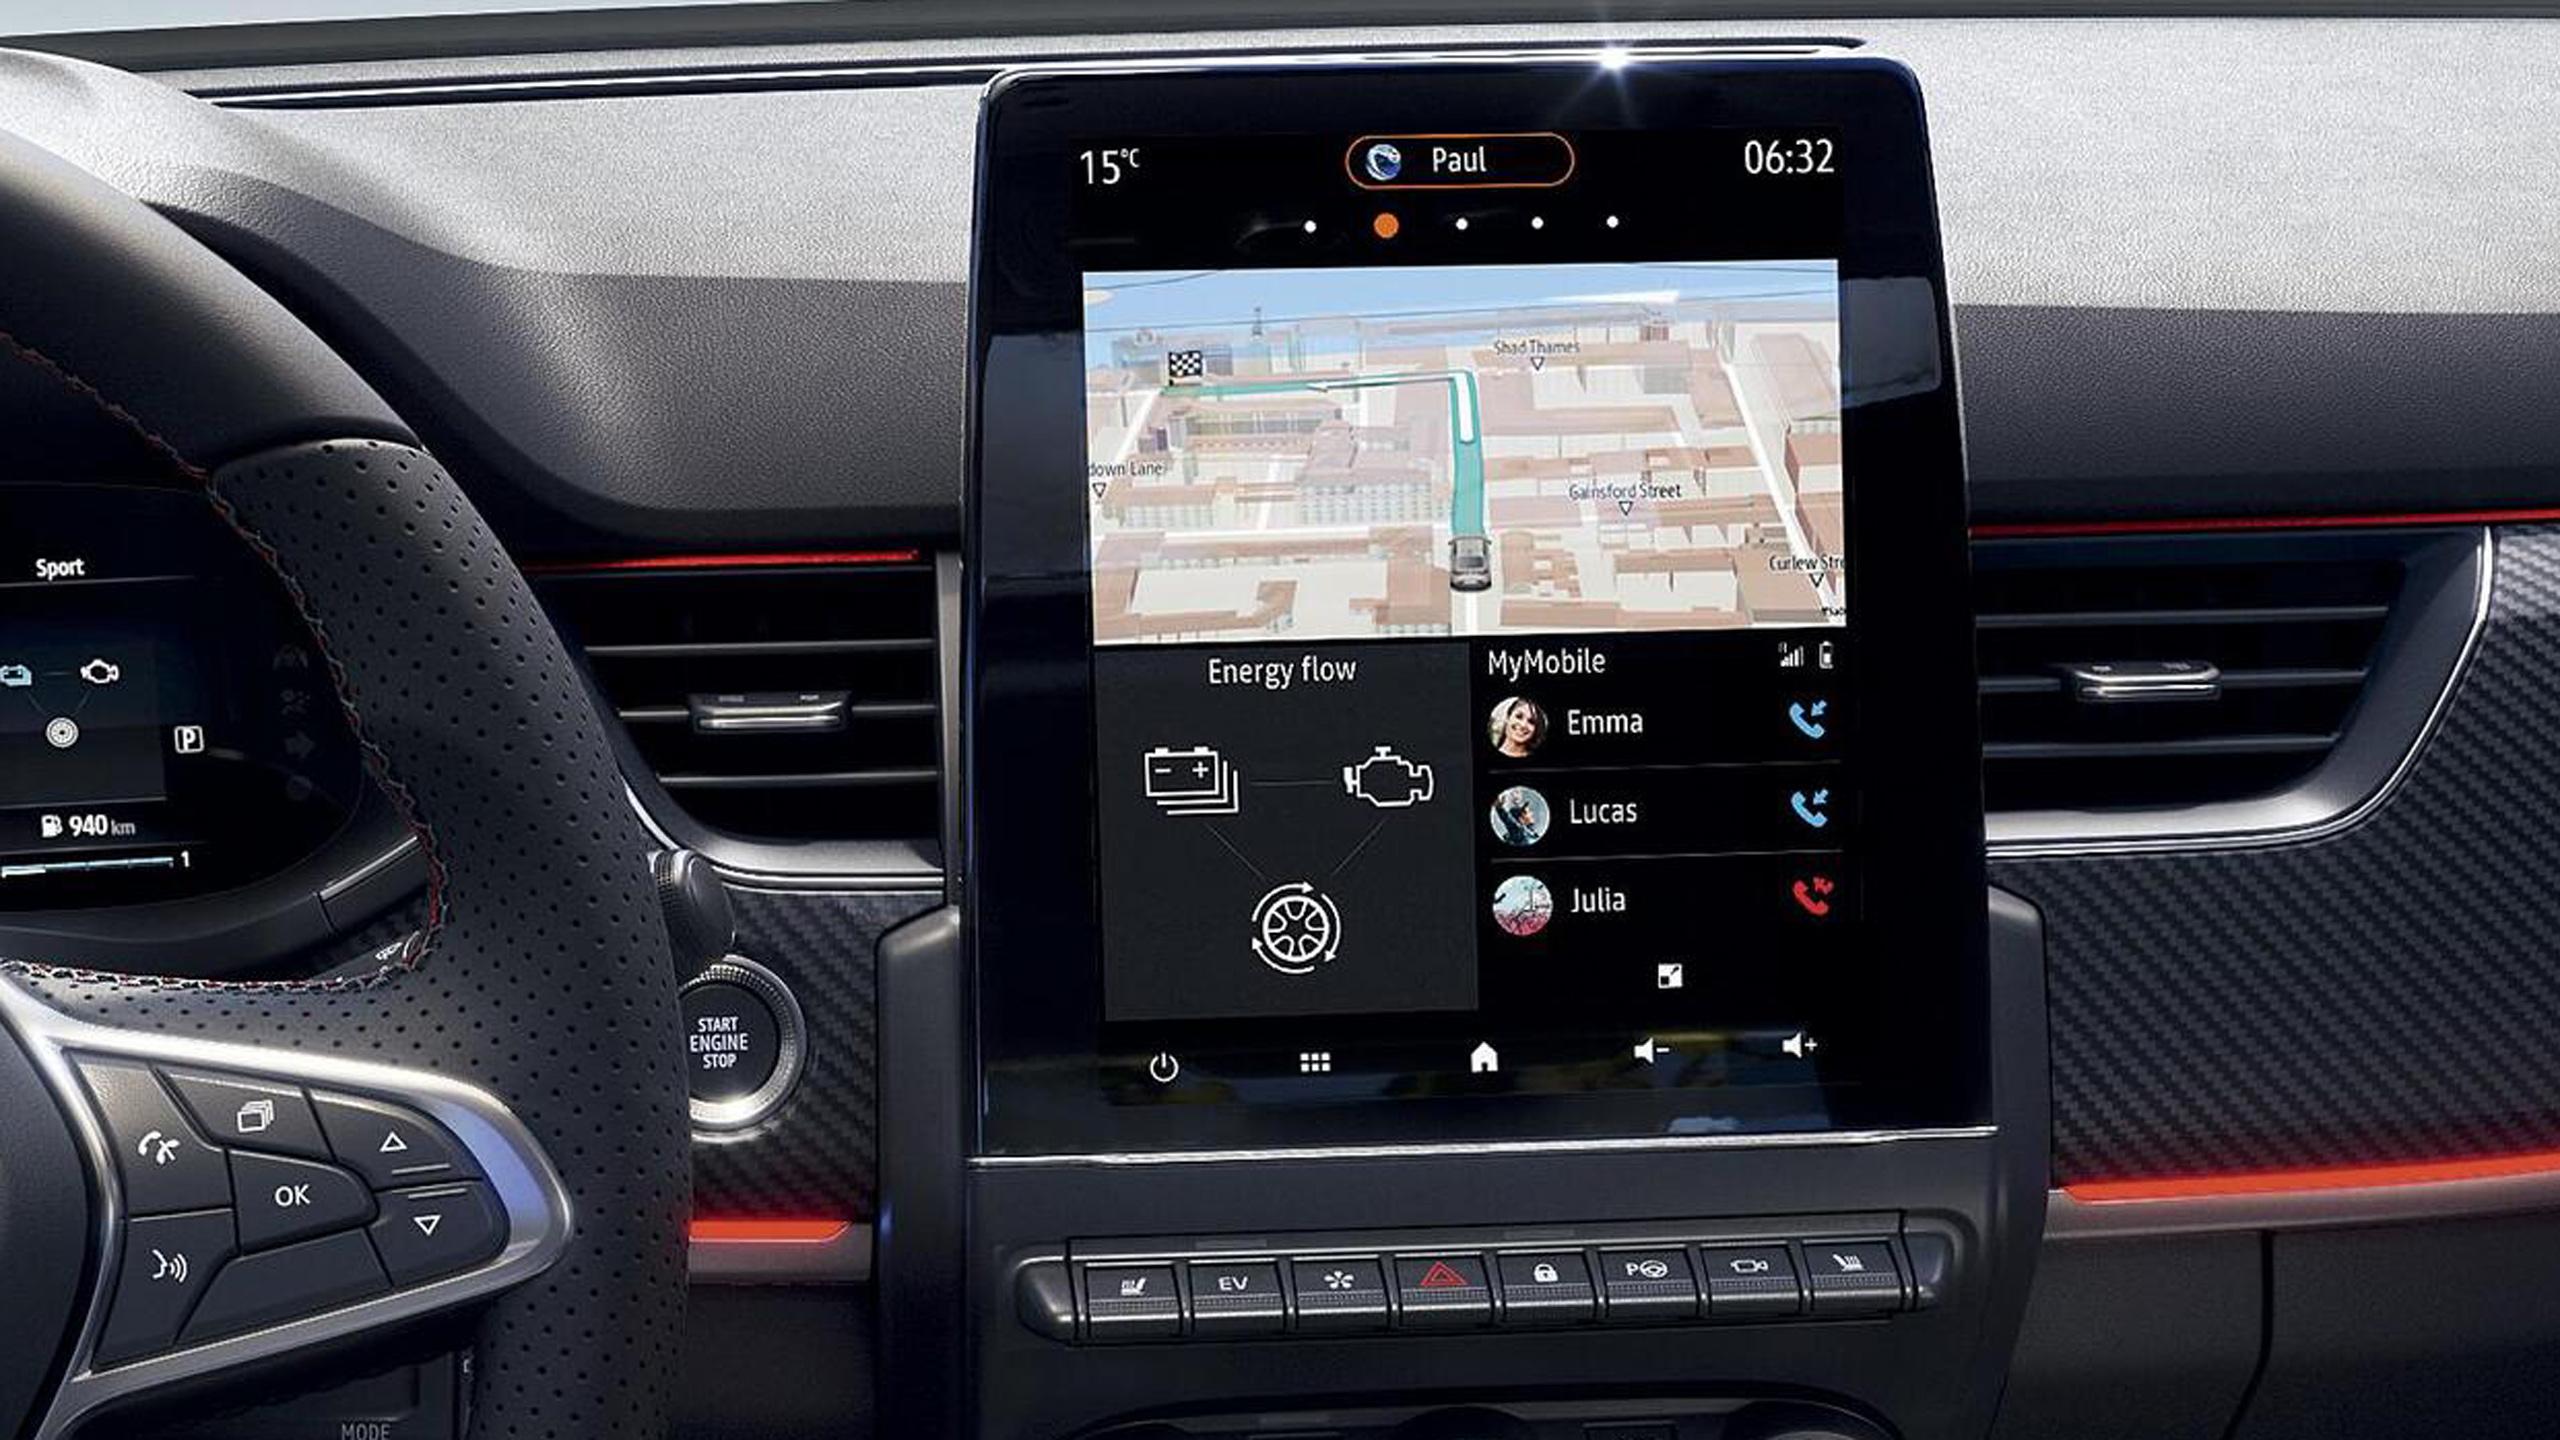 Online-Multimediasystem EASY LINK 9,3-Zoll Touchscreen mit Navigation